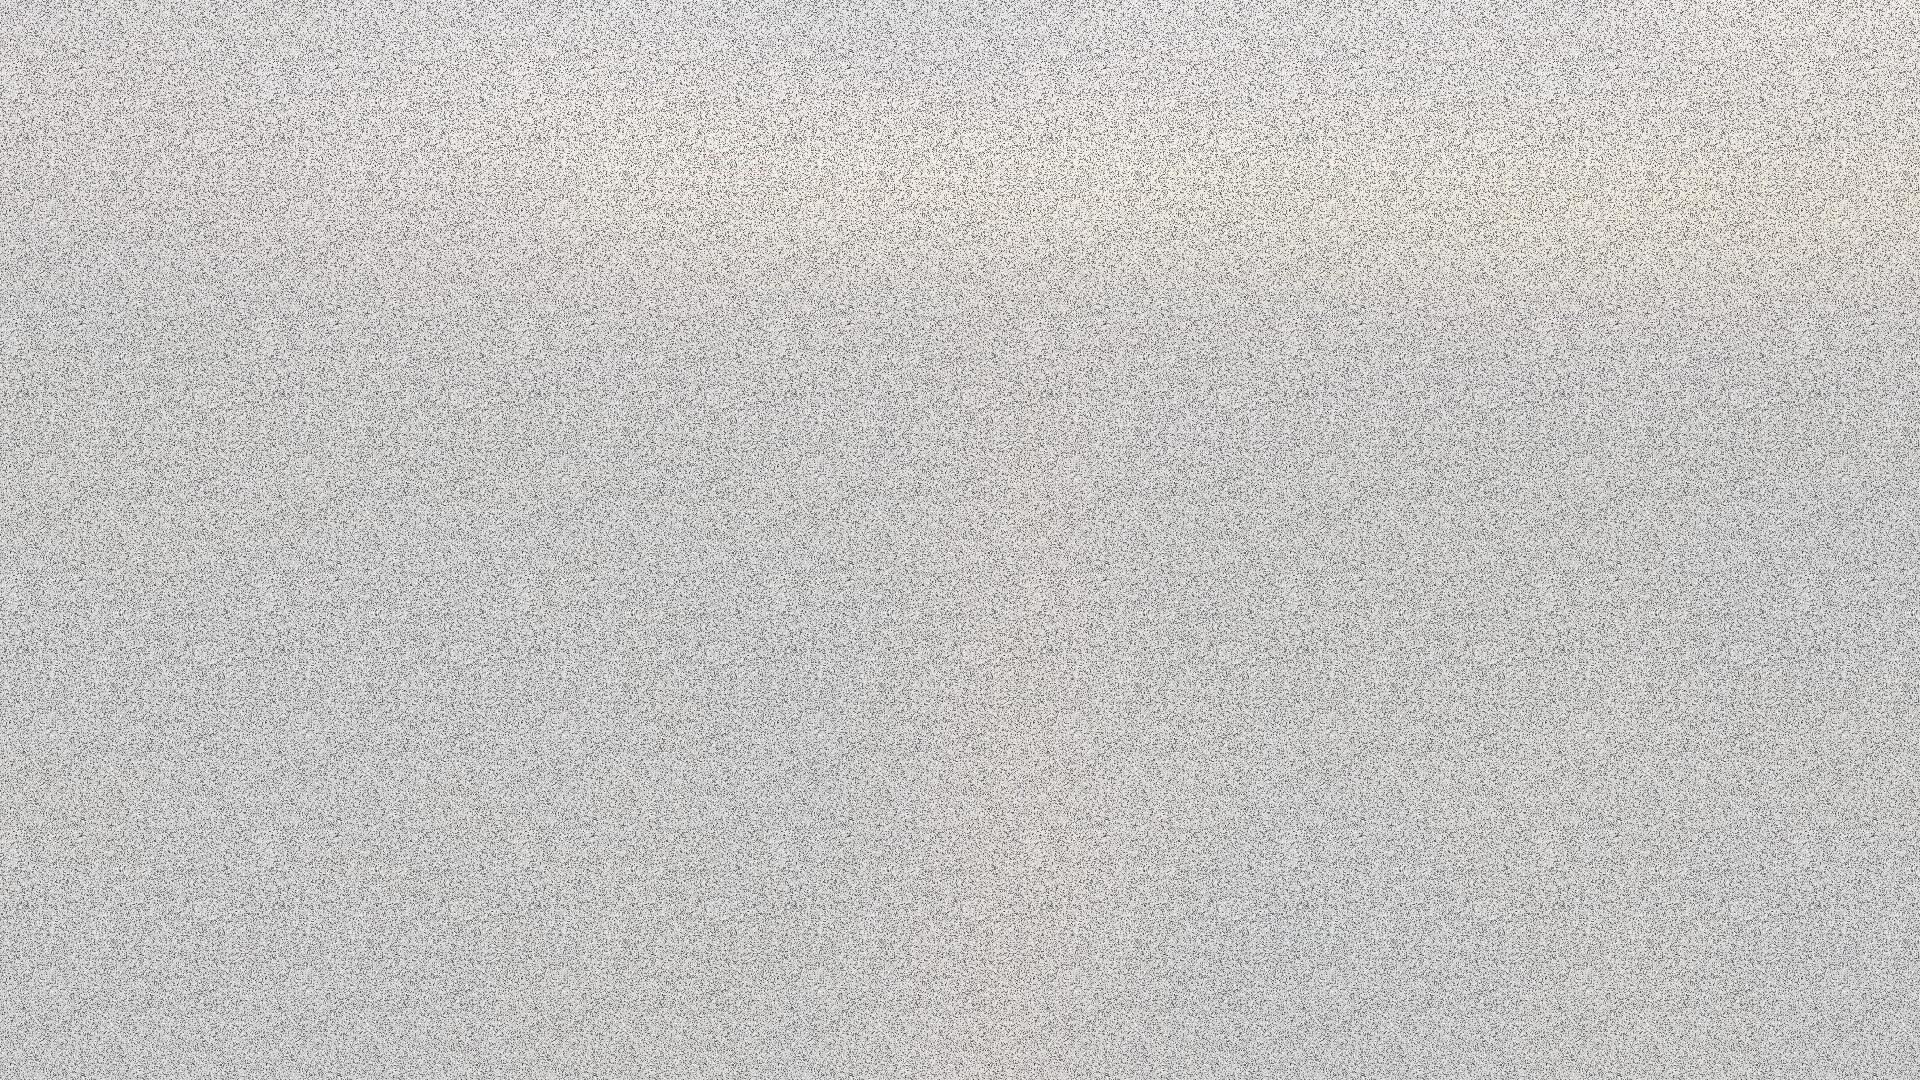 TV Static screenshot 1 TV Static screenshot 2 …